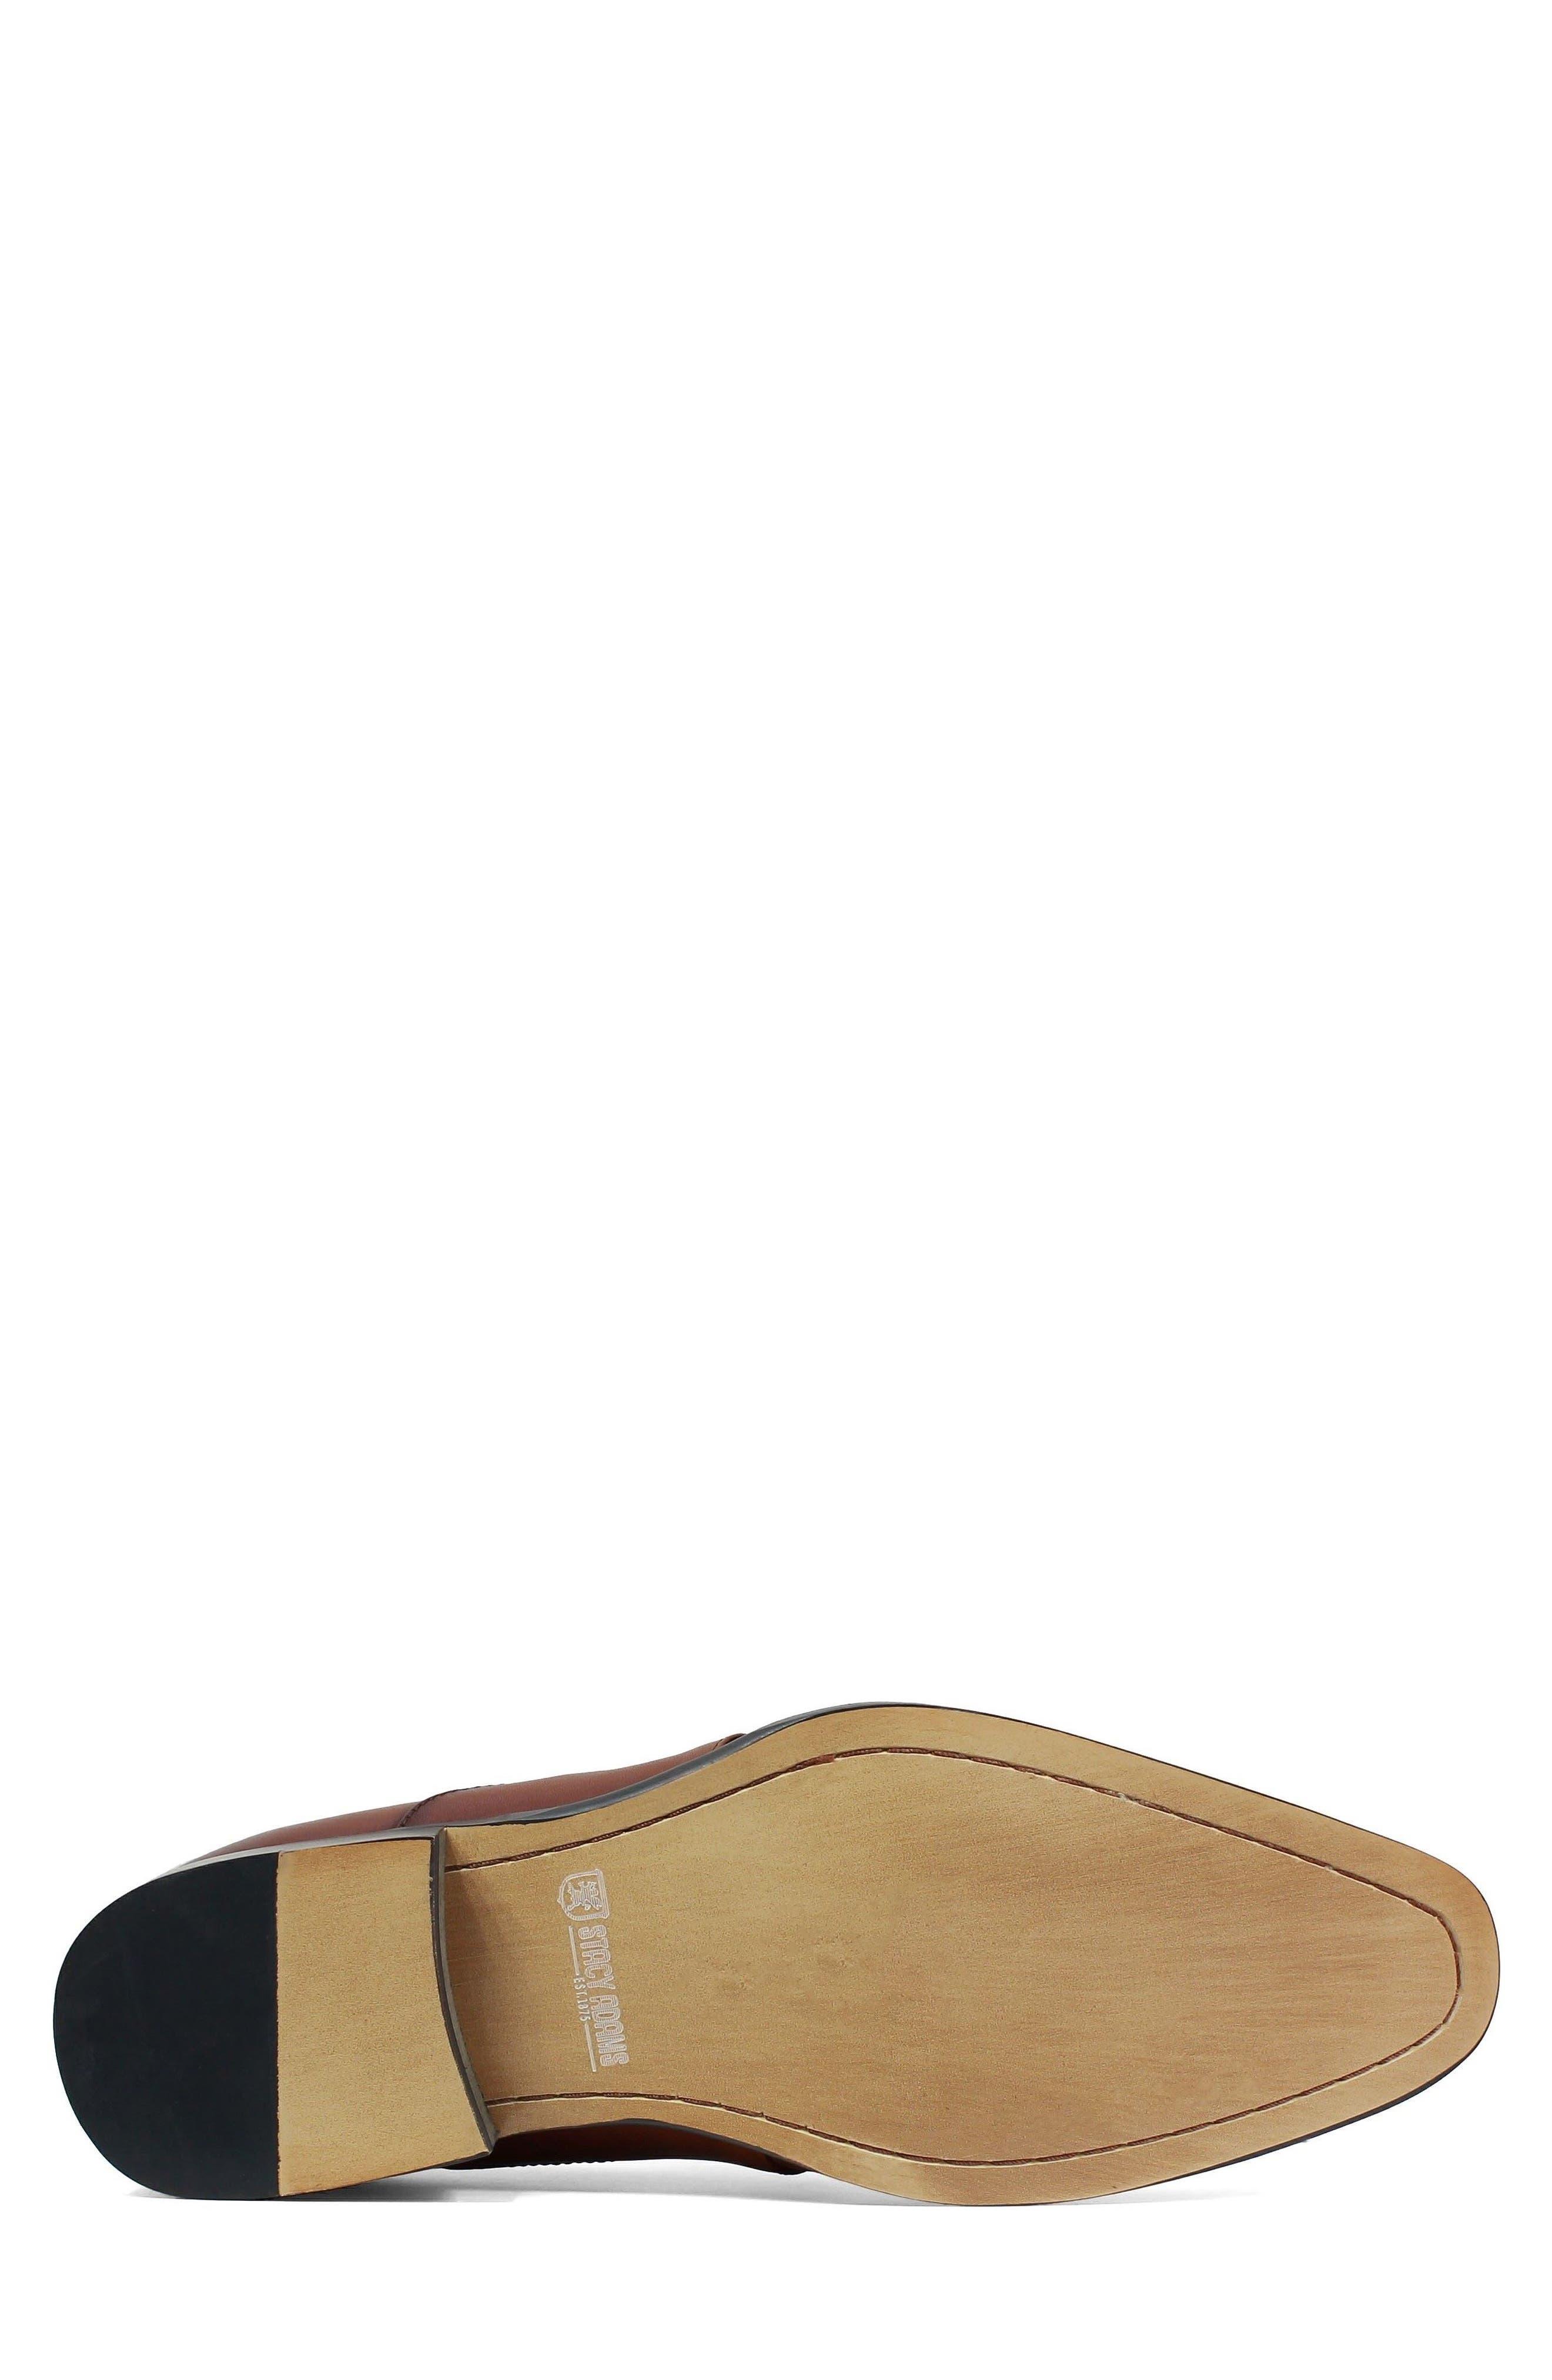 Shaw Bit Loafer,                             Alternate thumbnail 6, color,                             Cognac Leather